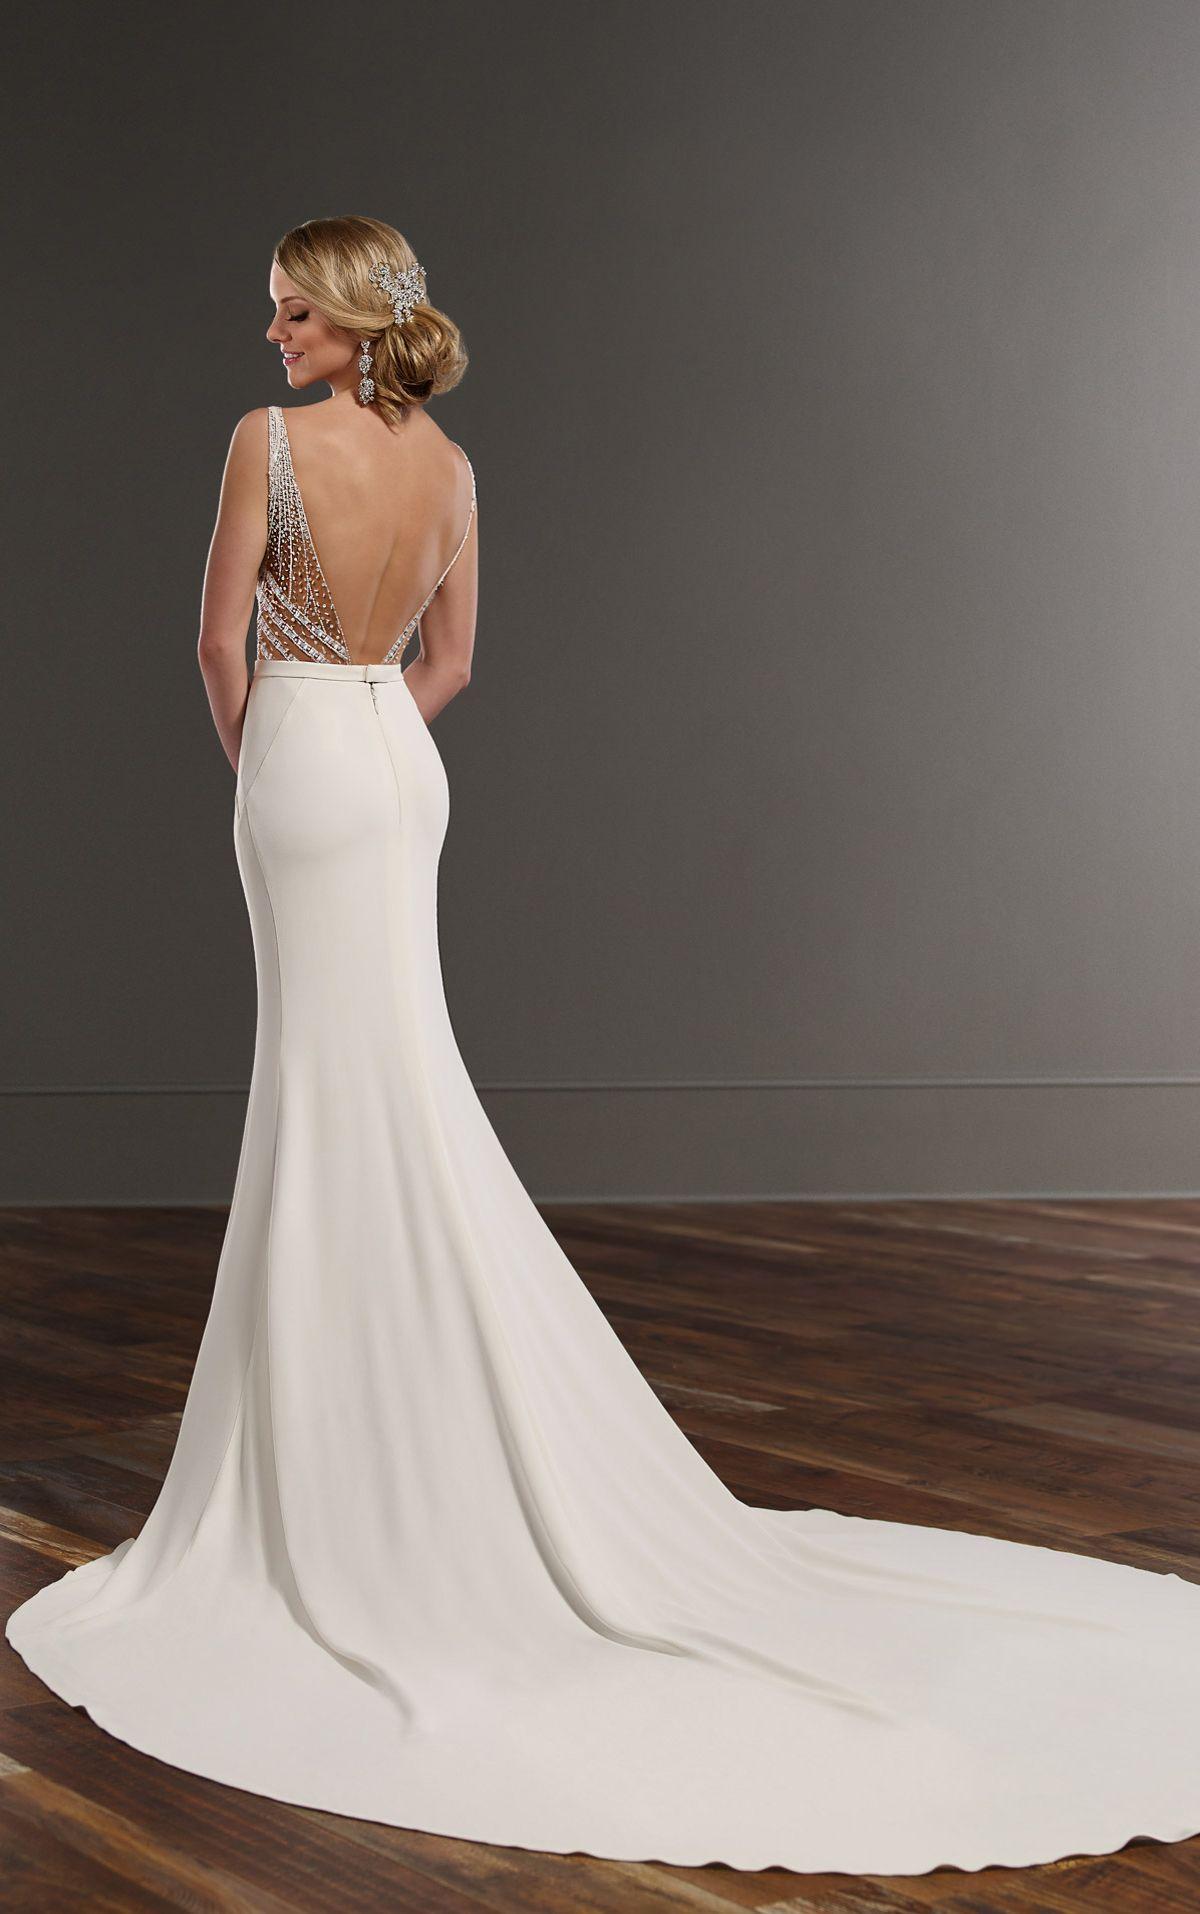 Beaded wedding dress with cathedral train martina liana